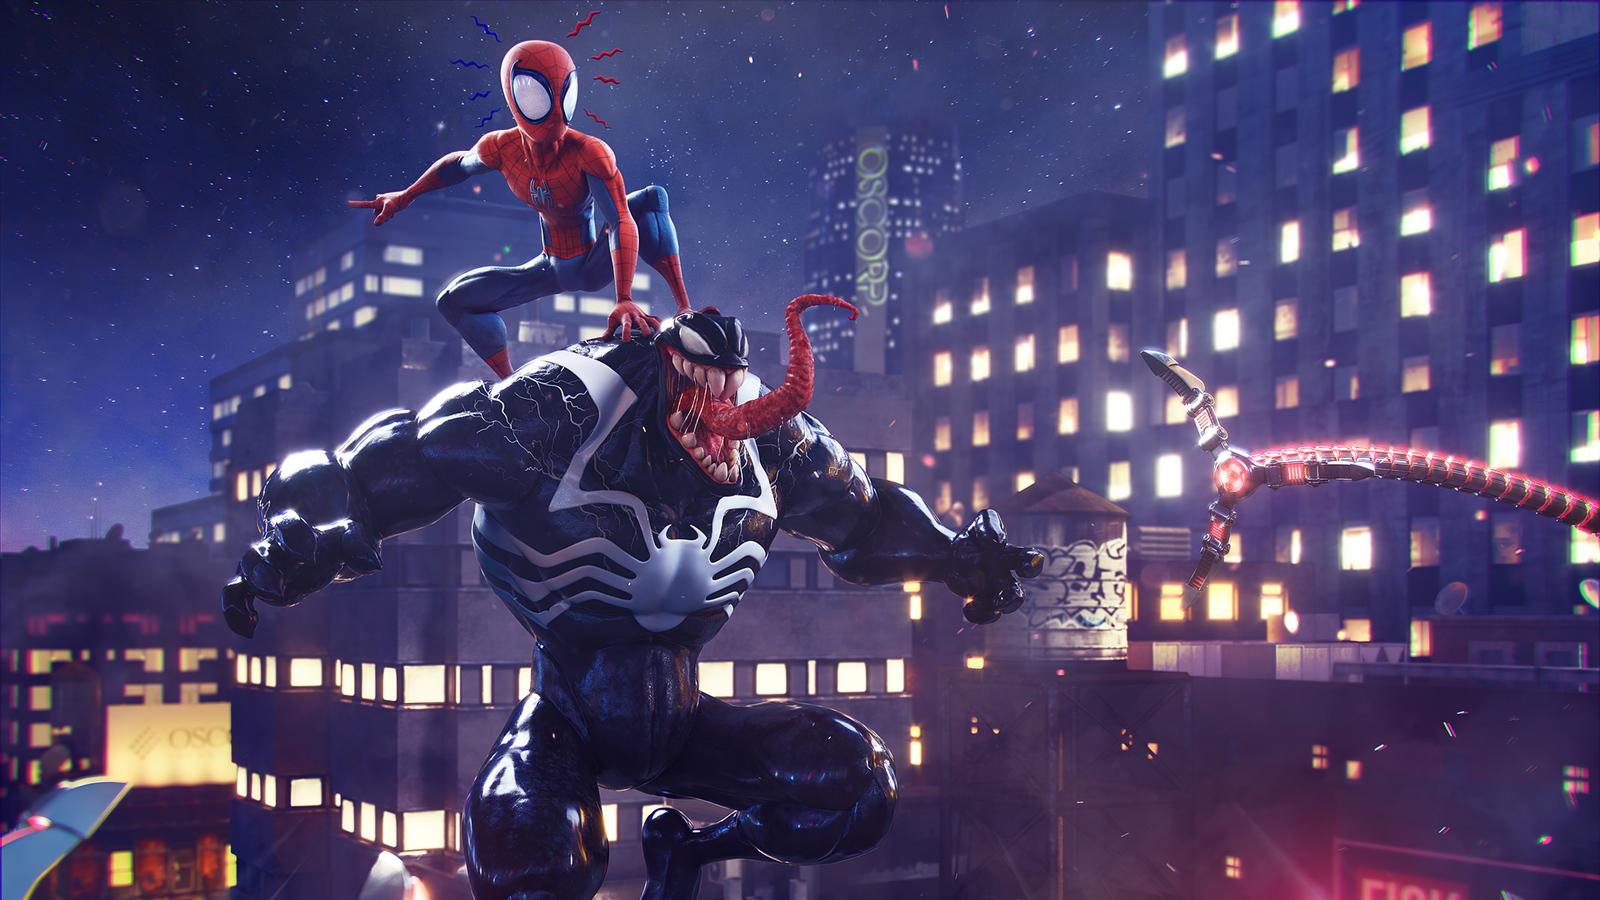 spider-man-vs-venom-artwork-nn.jpg